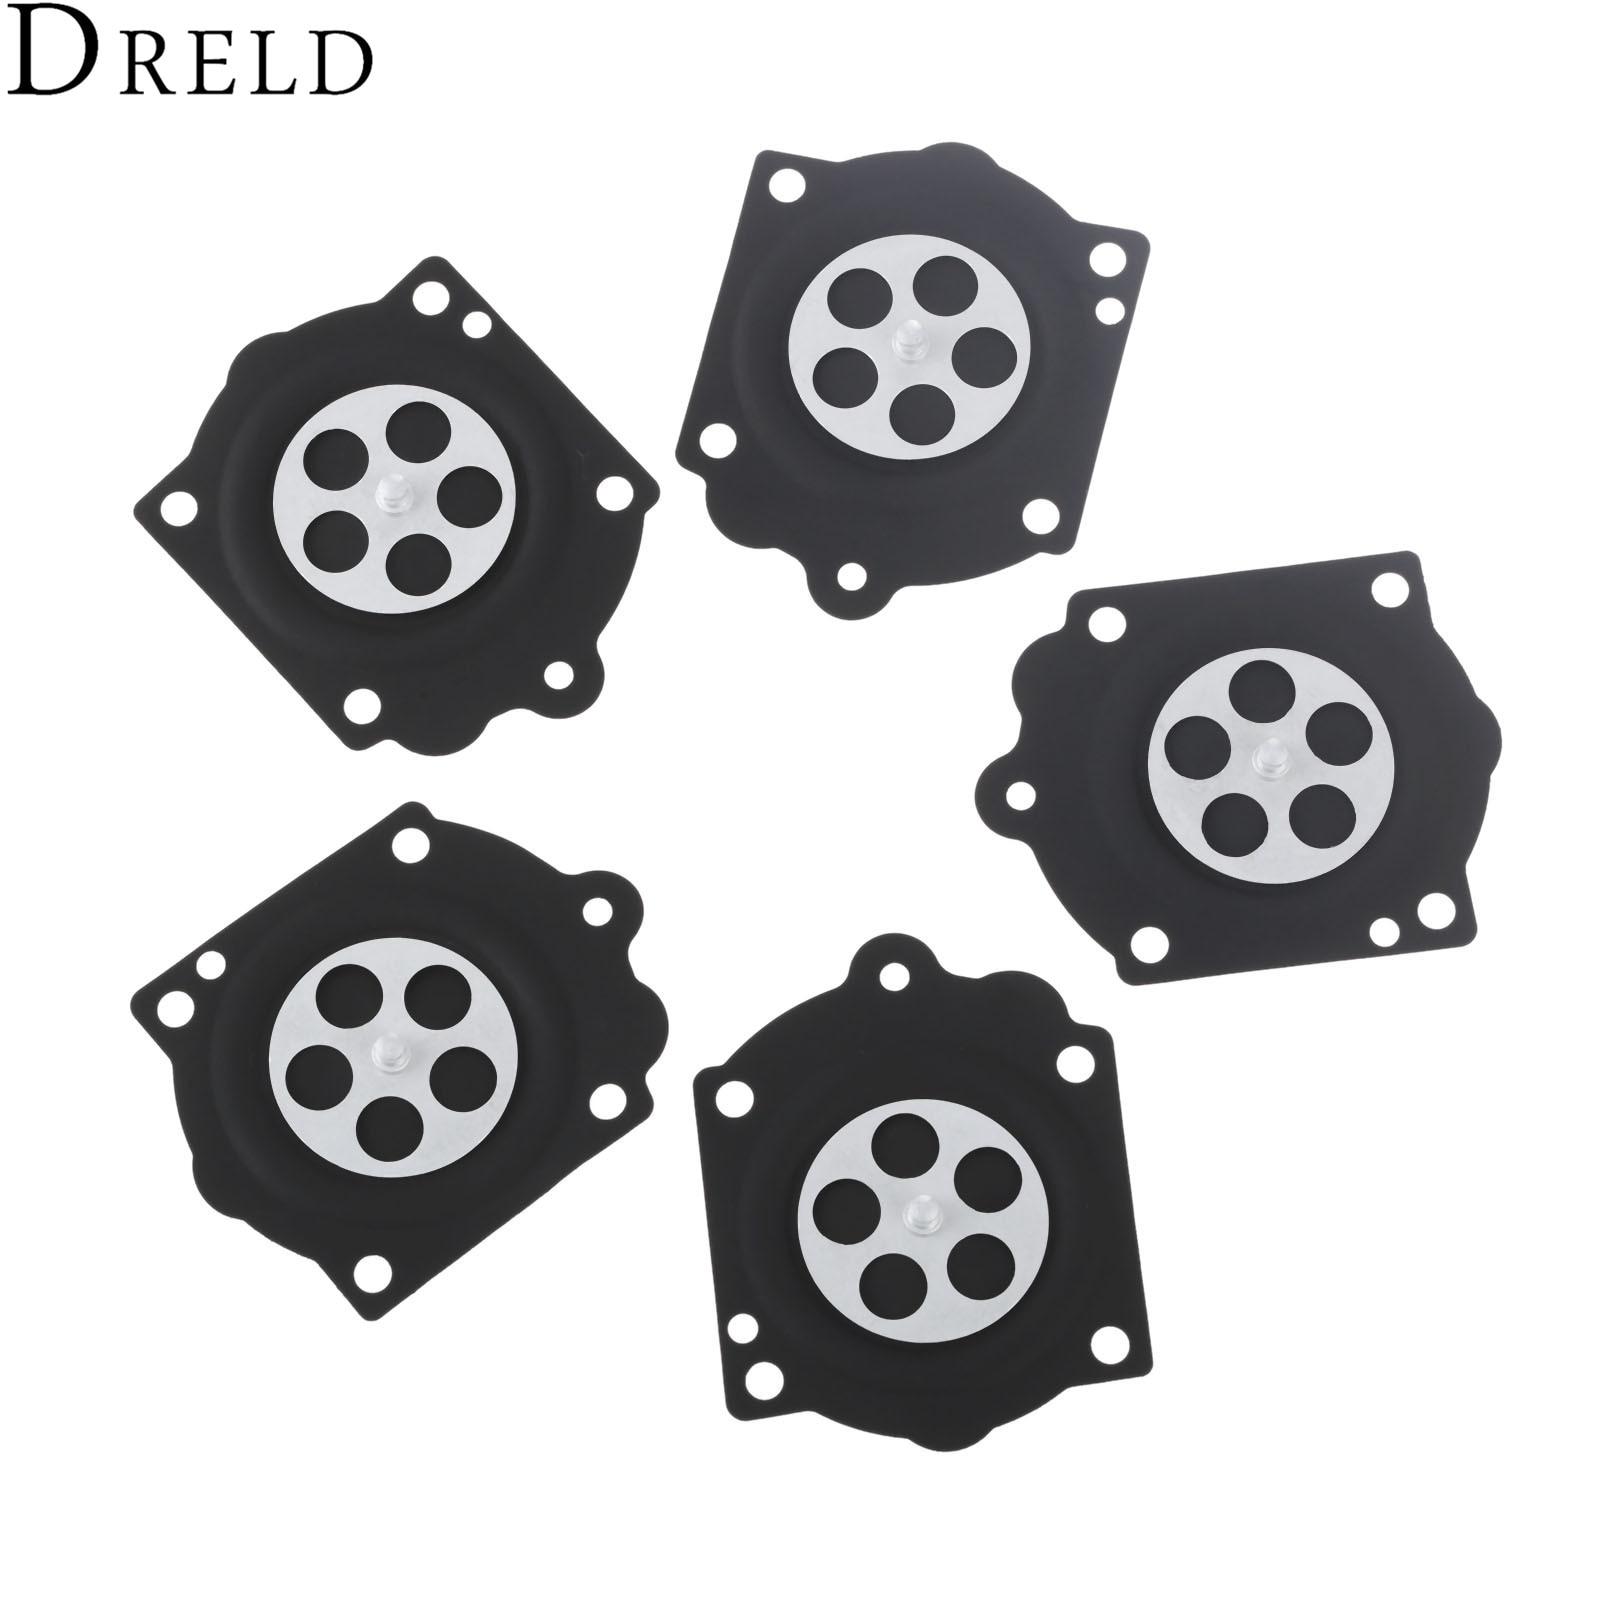 small resolution of dreld 5pcs carburetor carb rebuild metering diaphragm kit for walbro hdb wg mcculloch pro mac 610 husq 272 ms660 chainsaw k15 wj